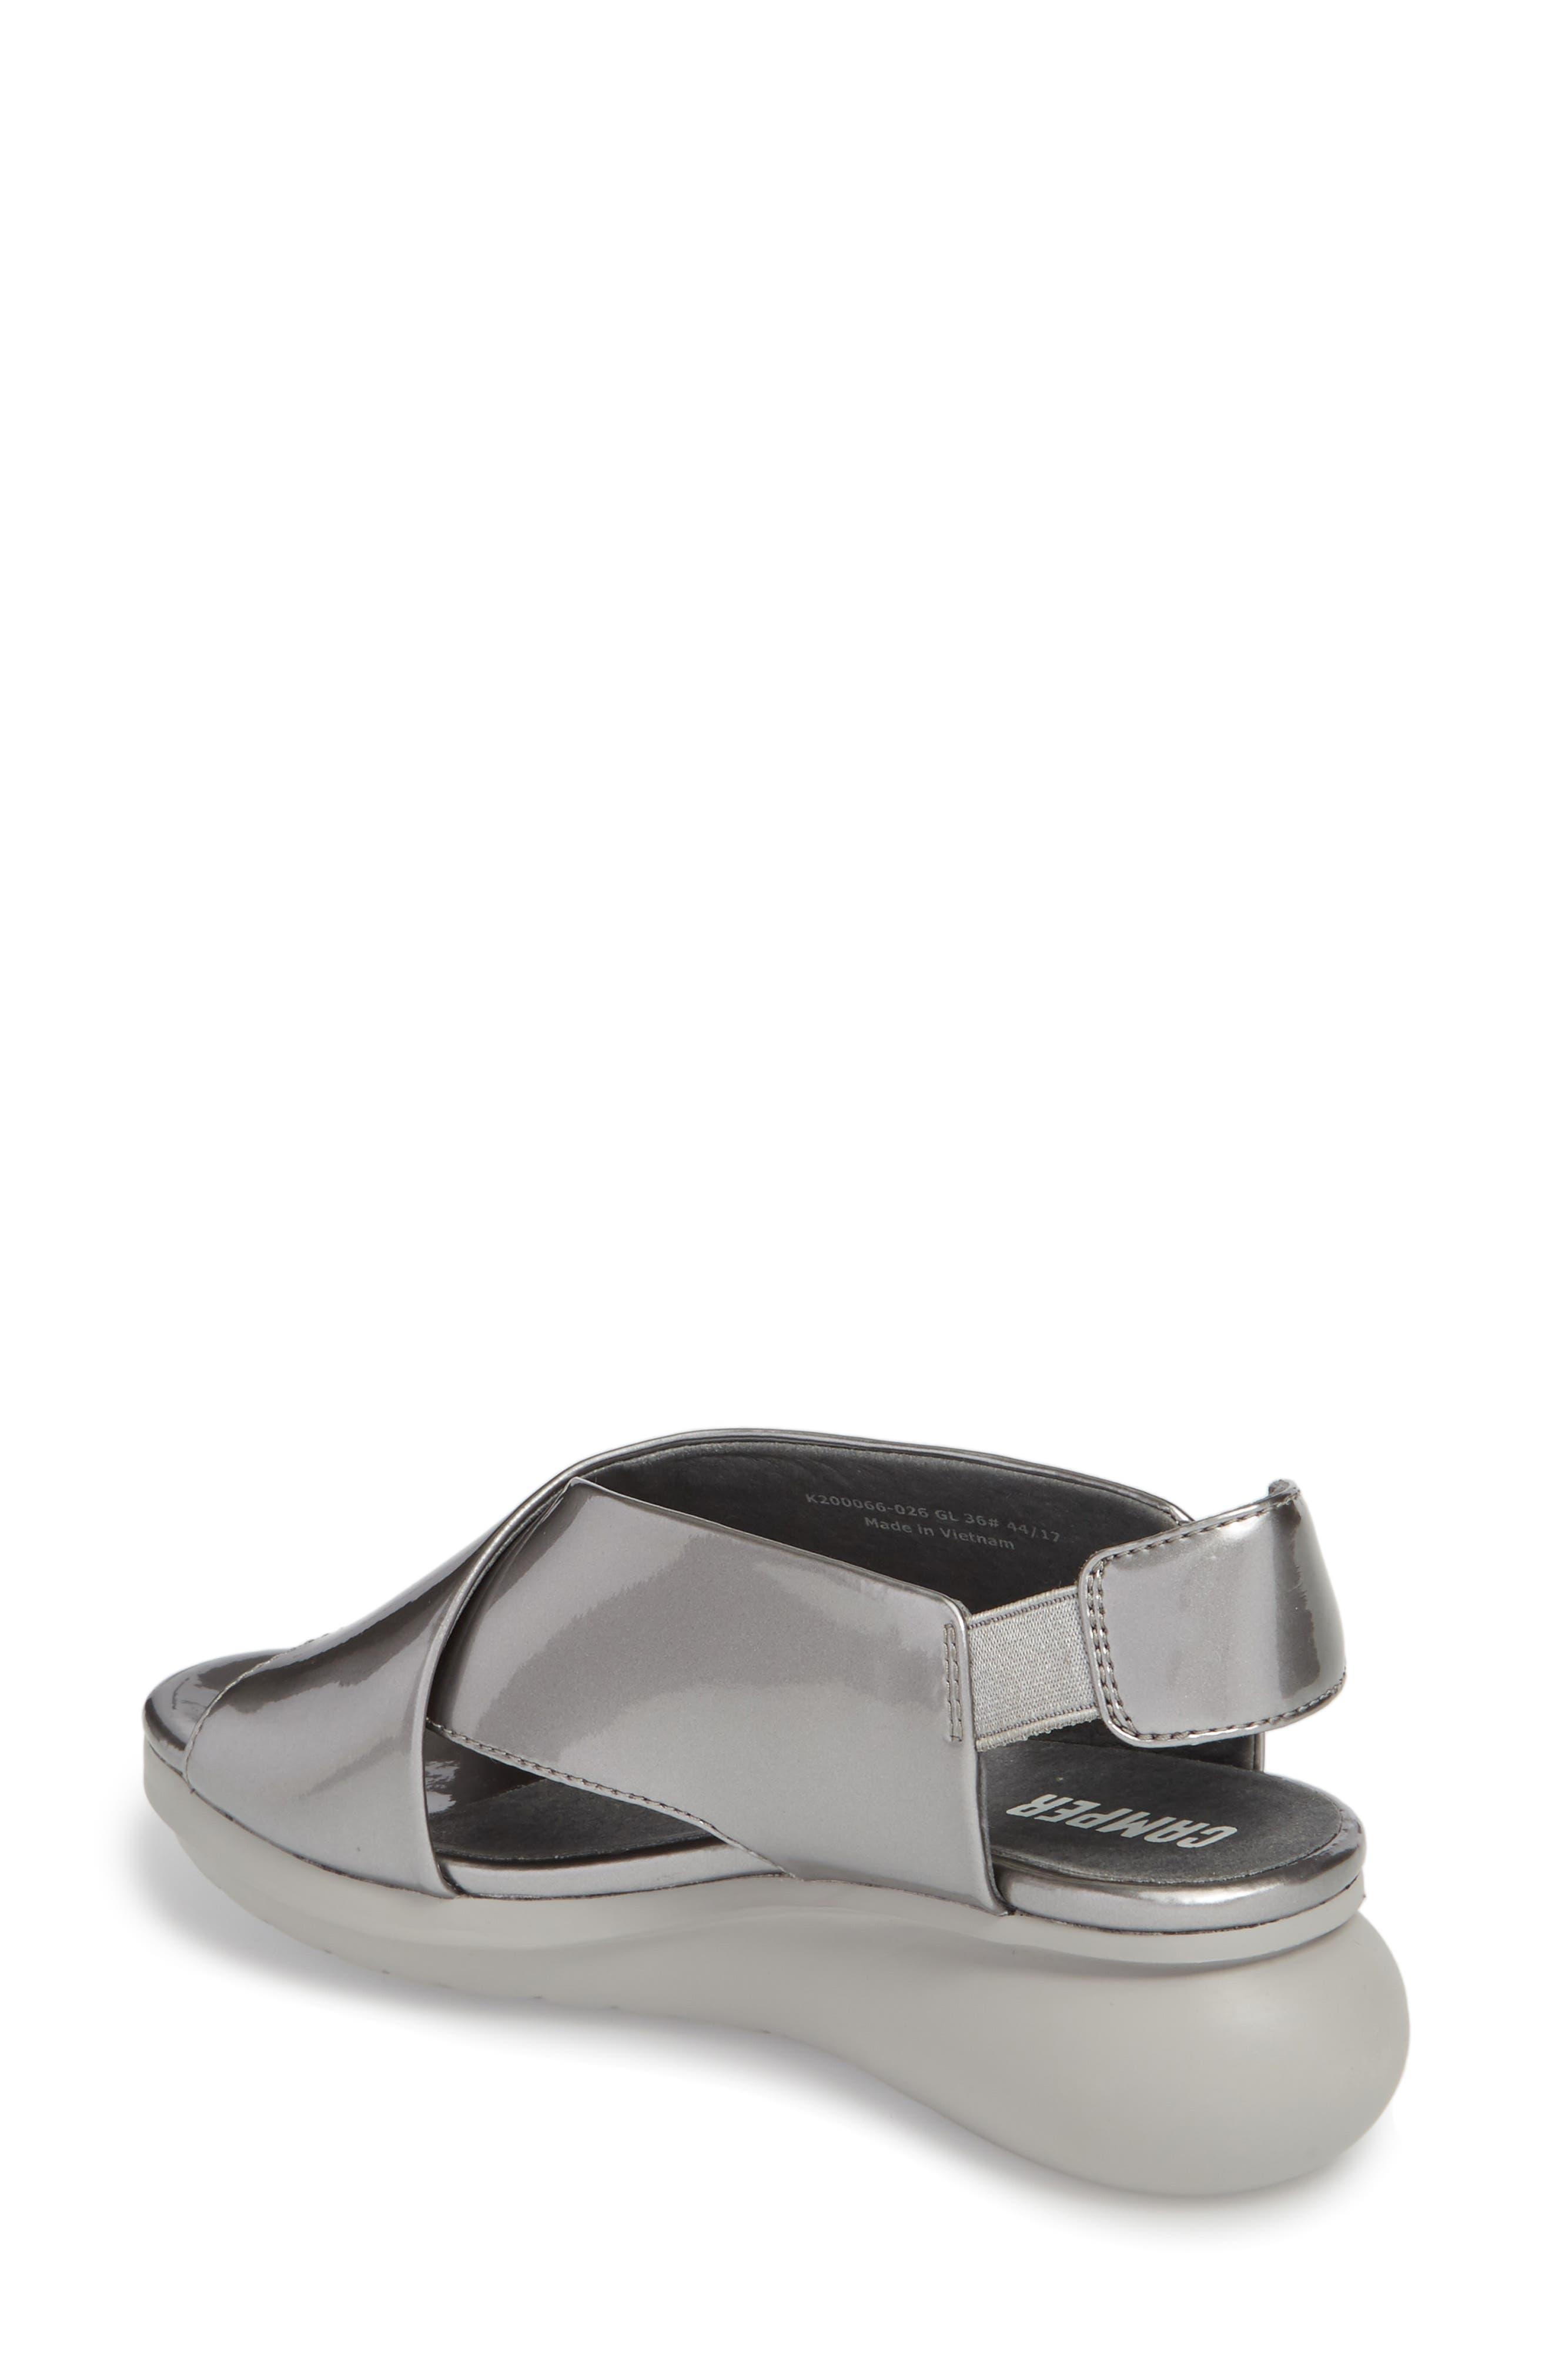 Balloon Wedge Sandal,                             Alternate thumbnail 2, color,                             Medium Gray Leather